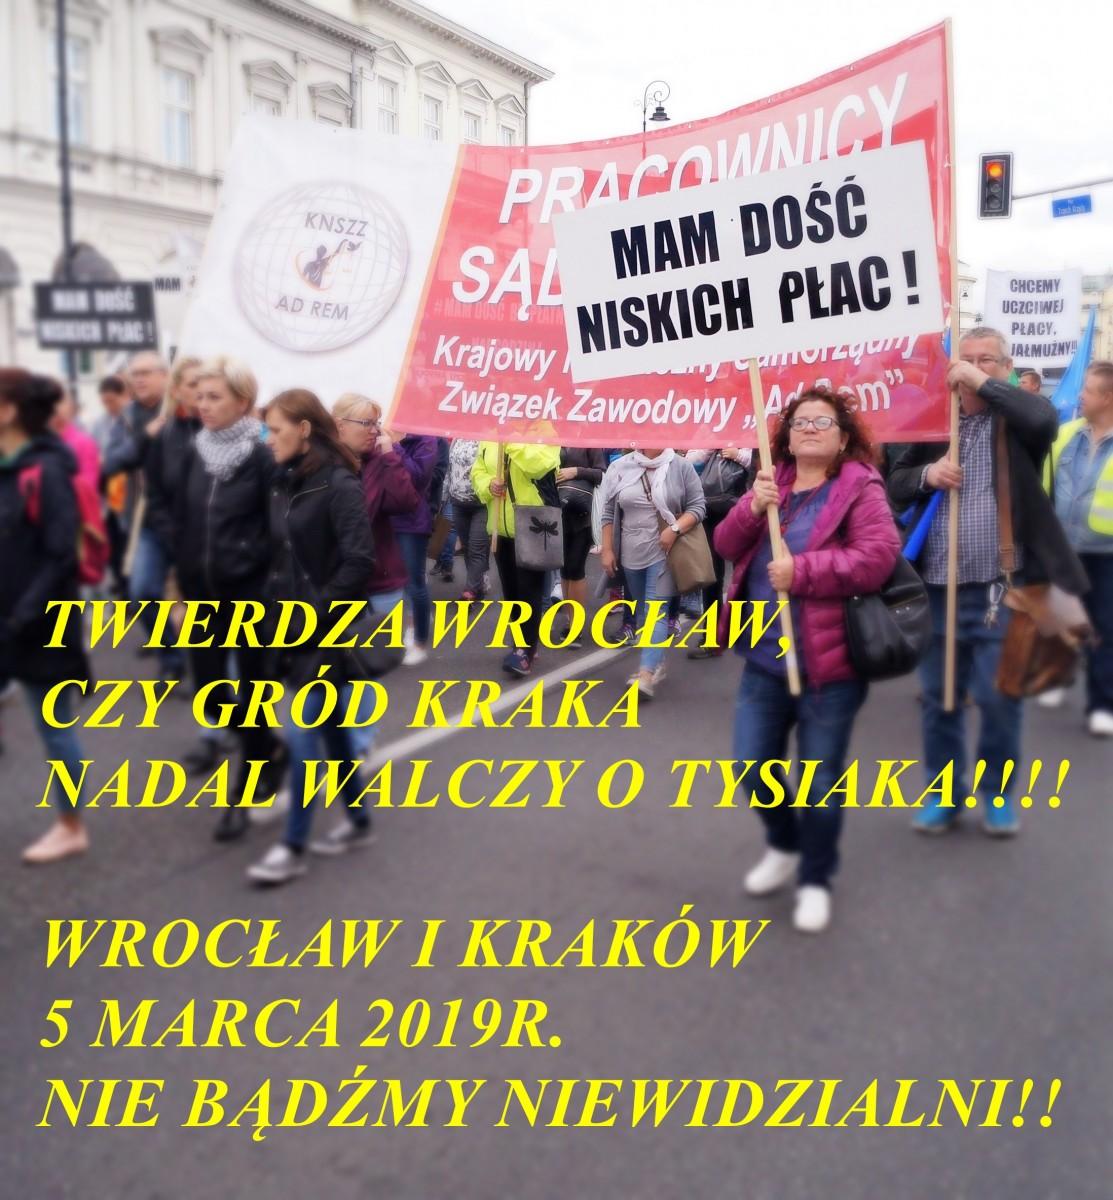 źródło: knszzadrem.pl